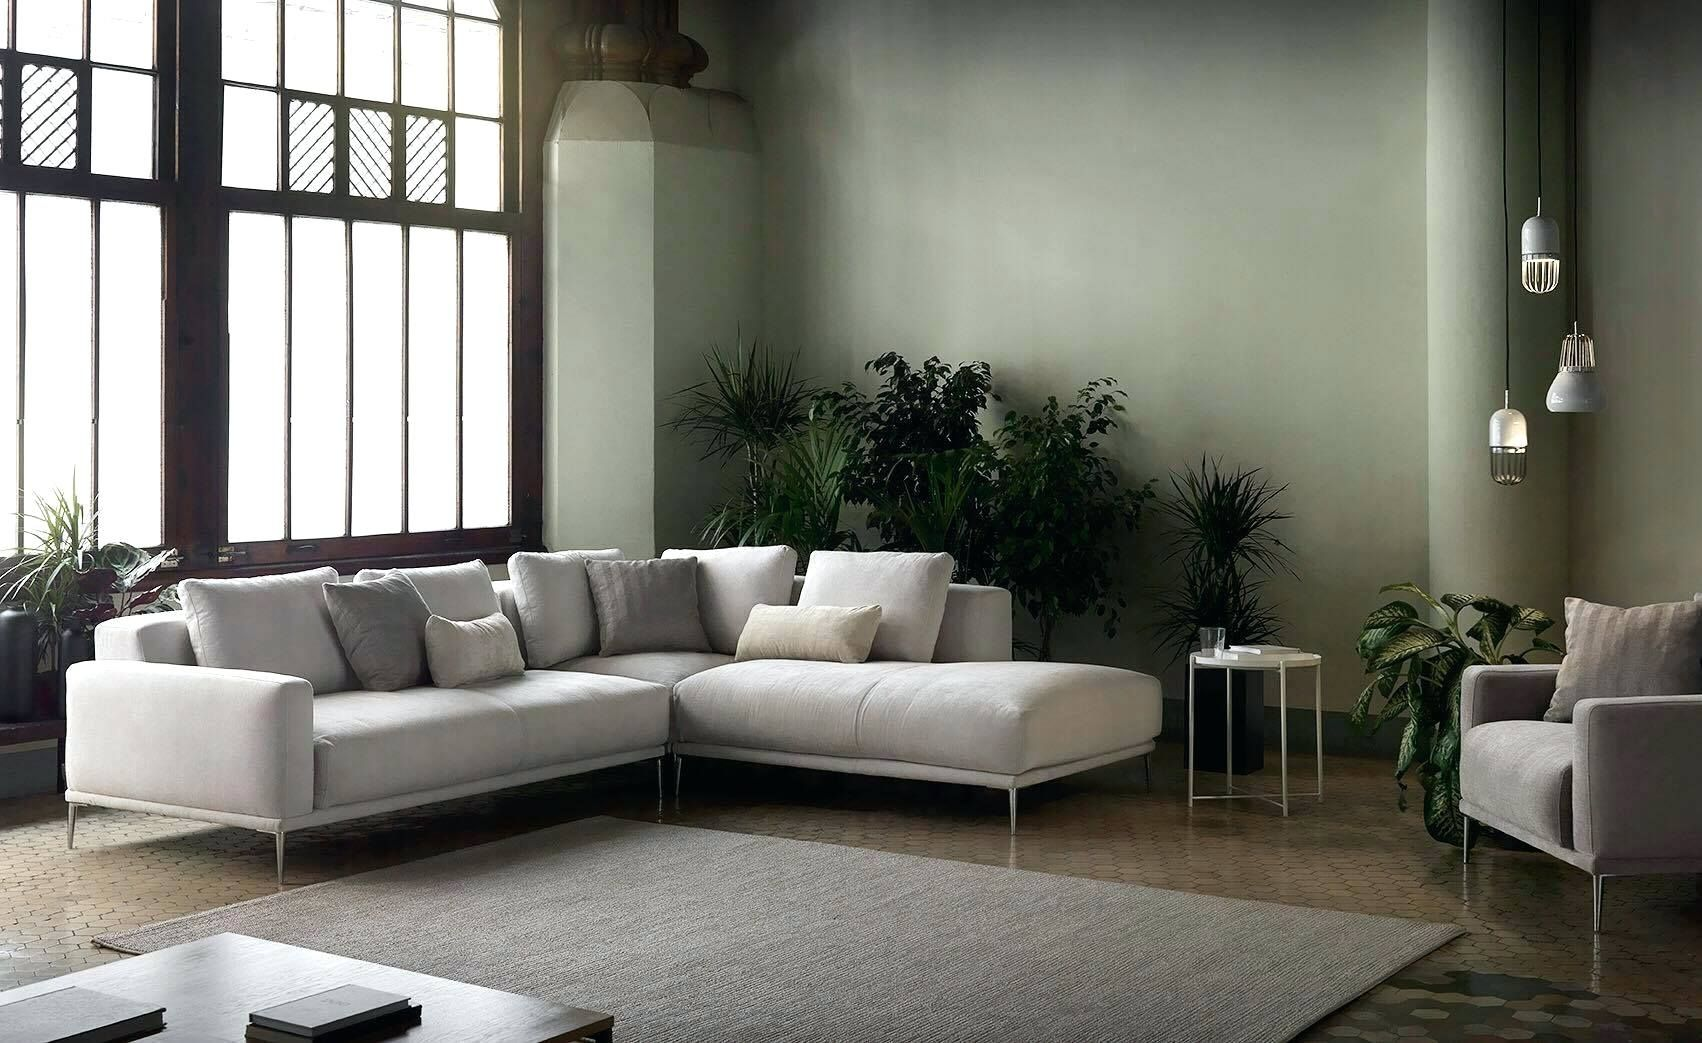 Modern amalfi sofa Photographs, elegant amalfi sofa for ...